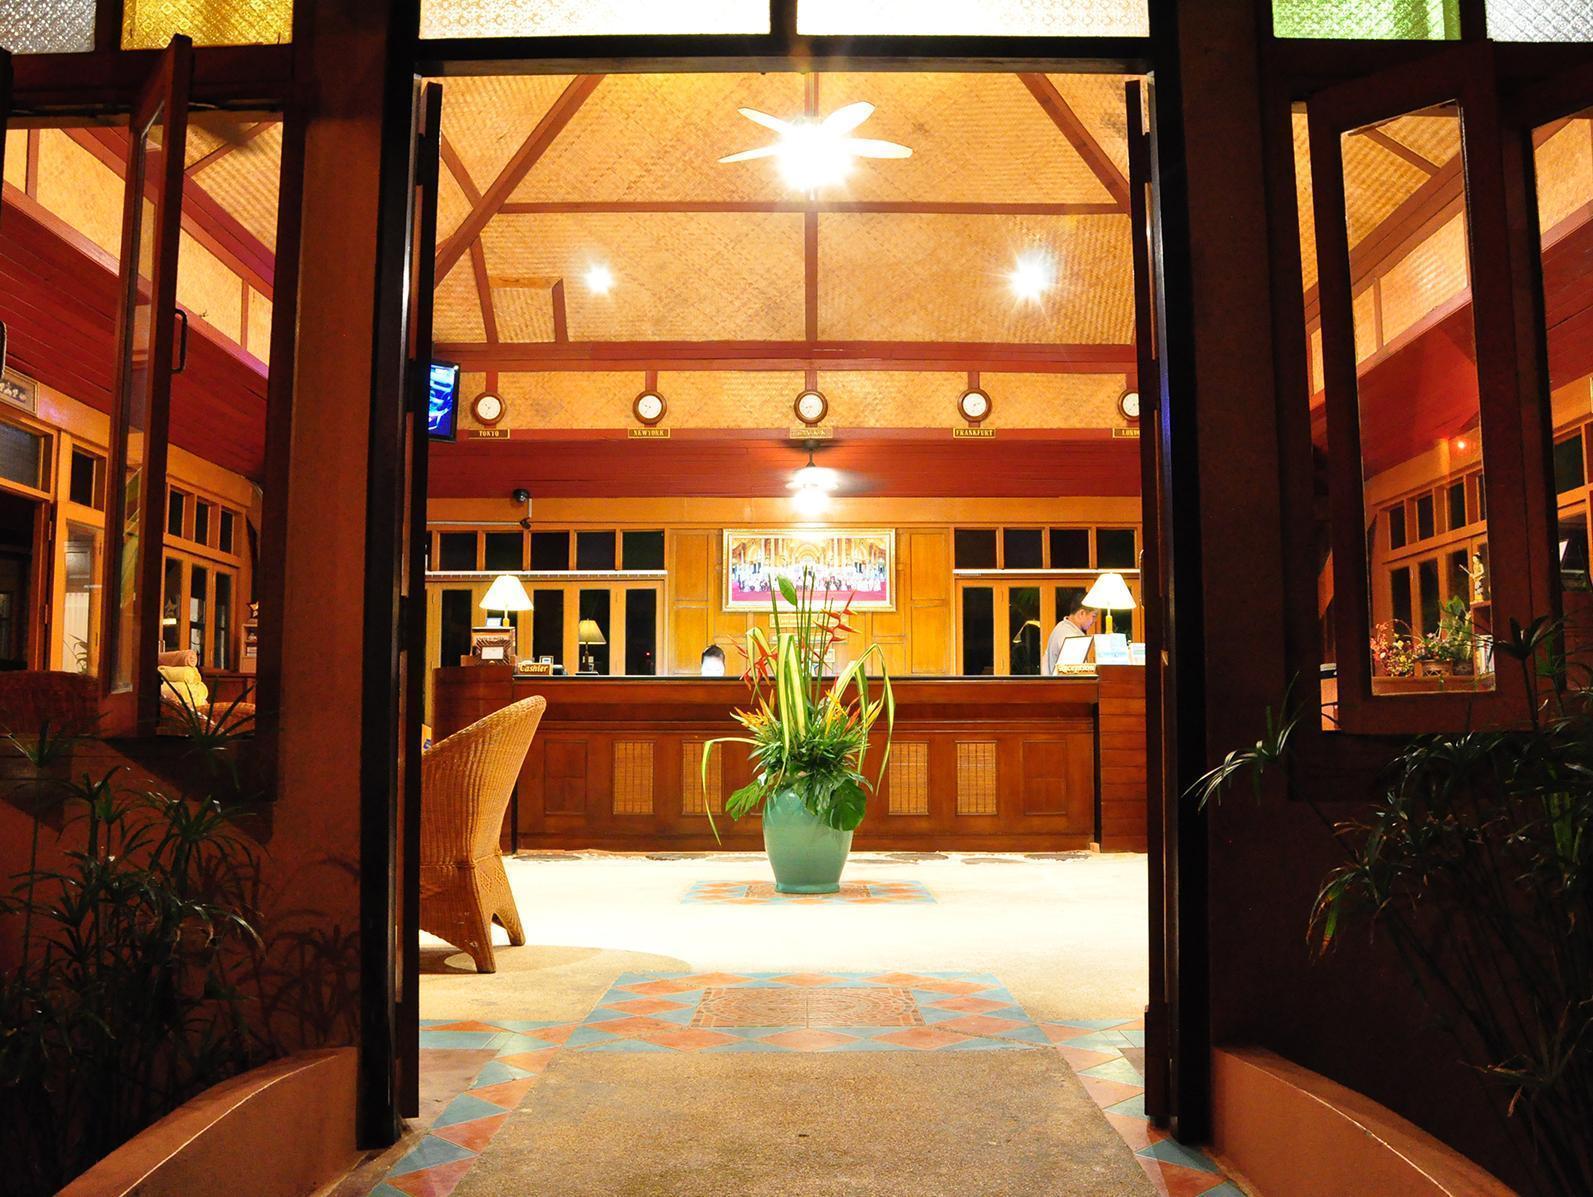 P. P. Erawan Palms Resort พีพี เอราวัณ ปาล์มส รีสอร์ท